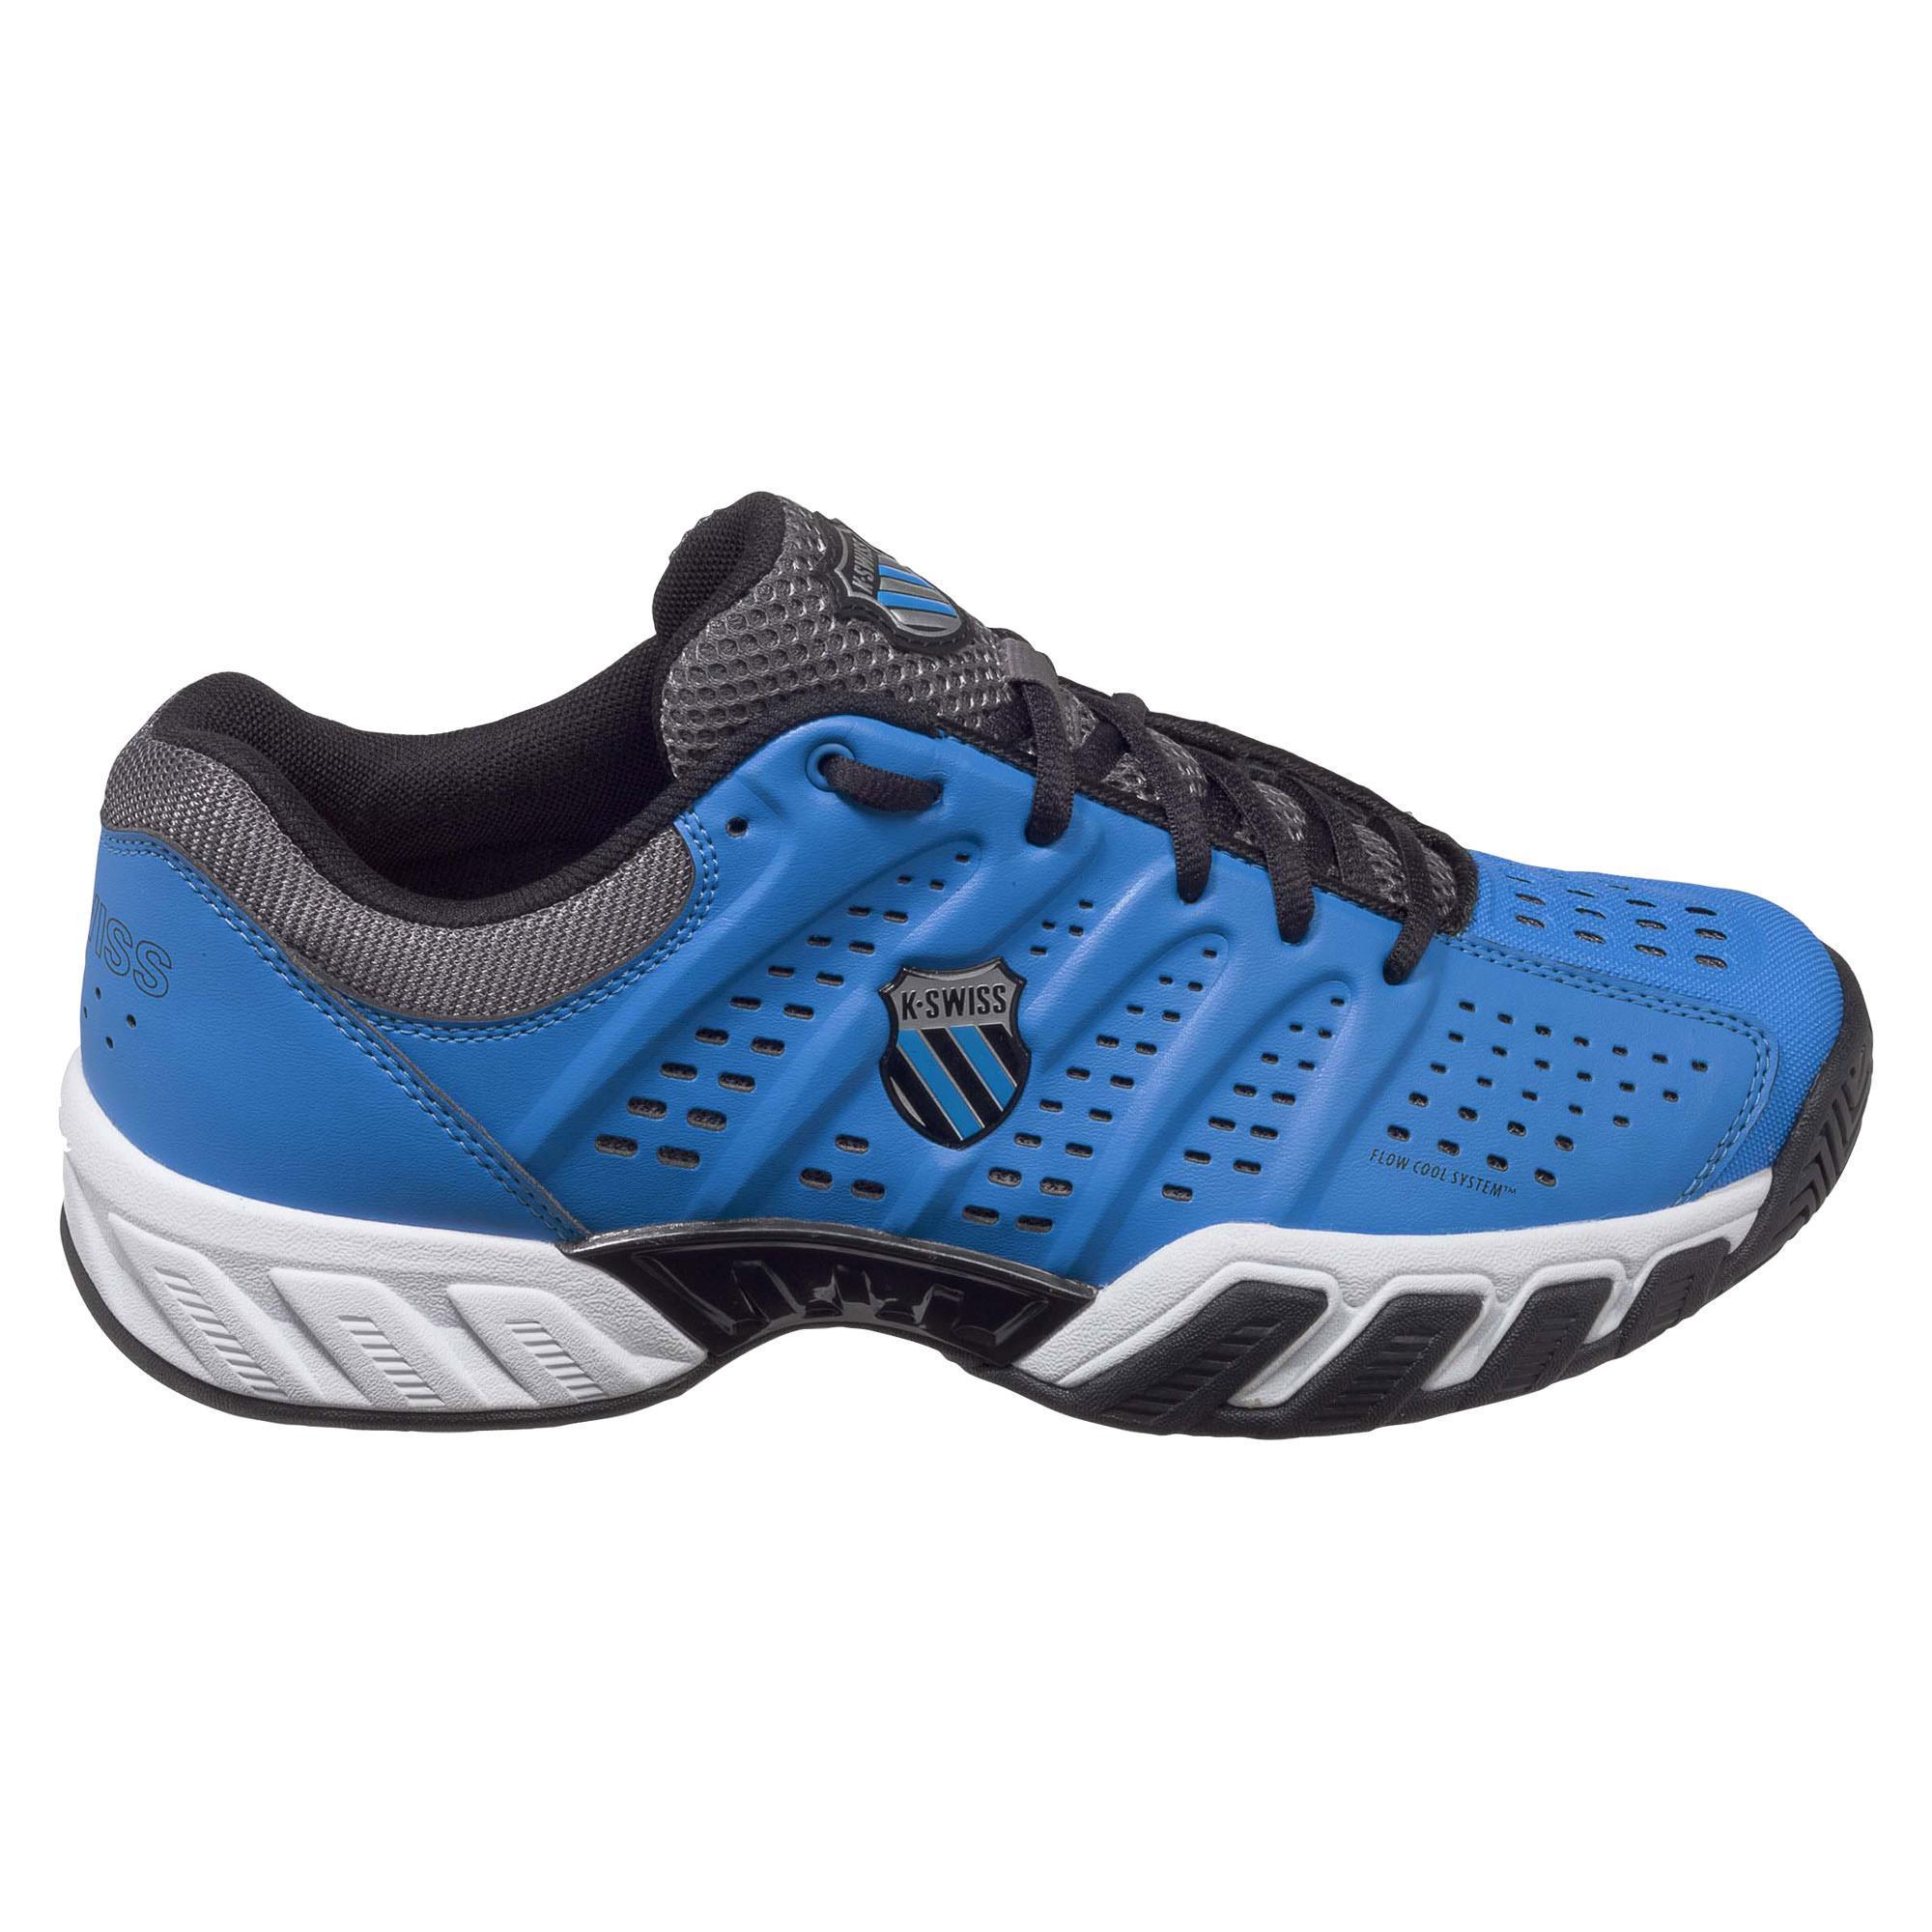 K swiss mens bigshot light tennis shoes brilliant blue for Fish tennis shoes